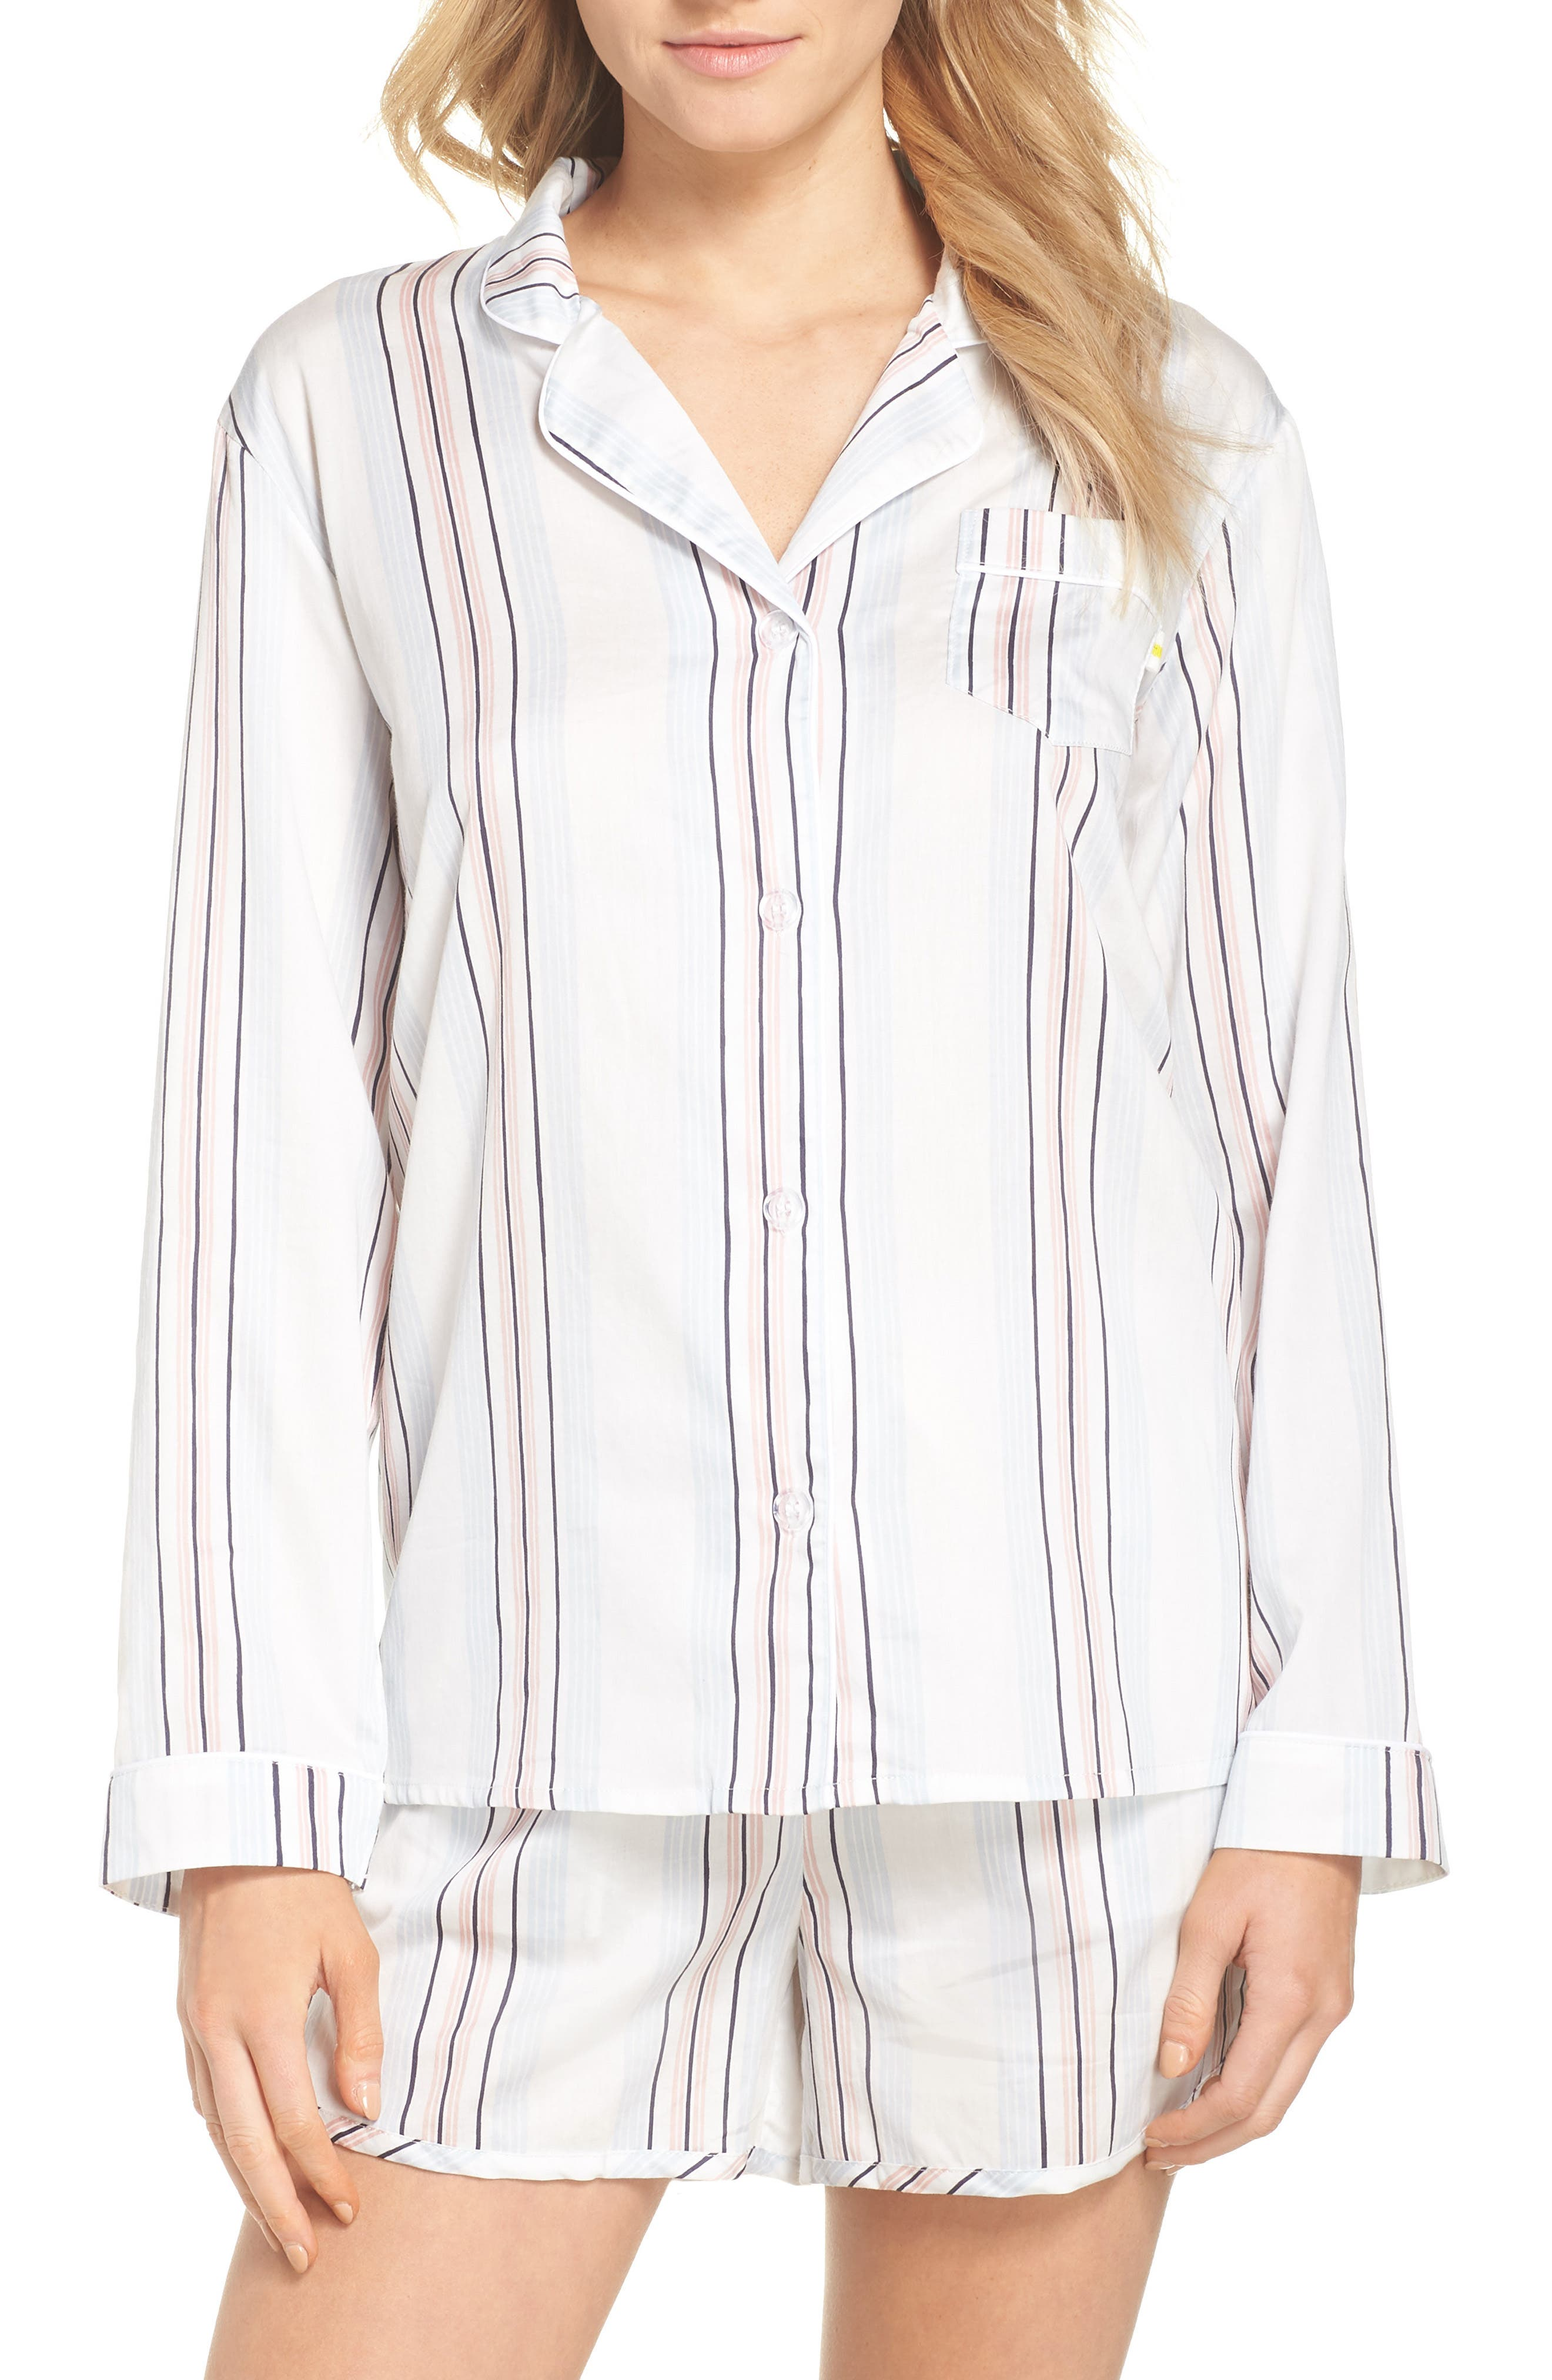 Candy Stripe Short Pajamas,                         Main,                         color, 110